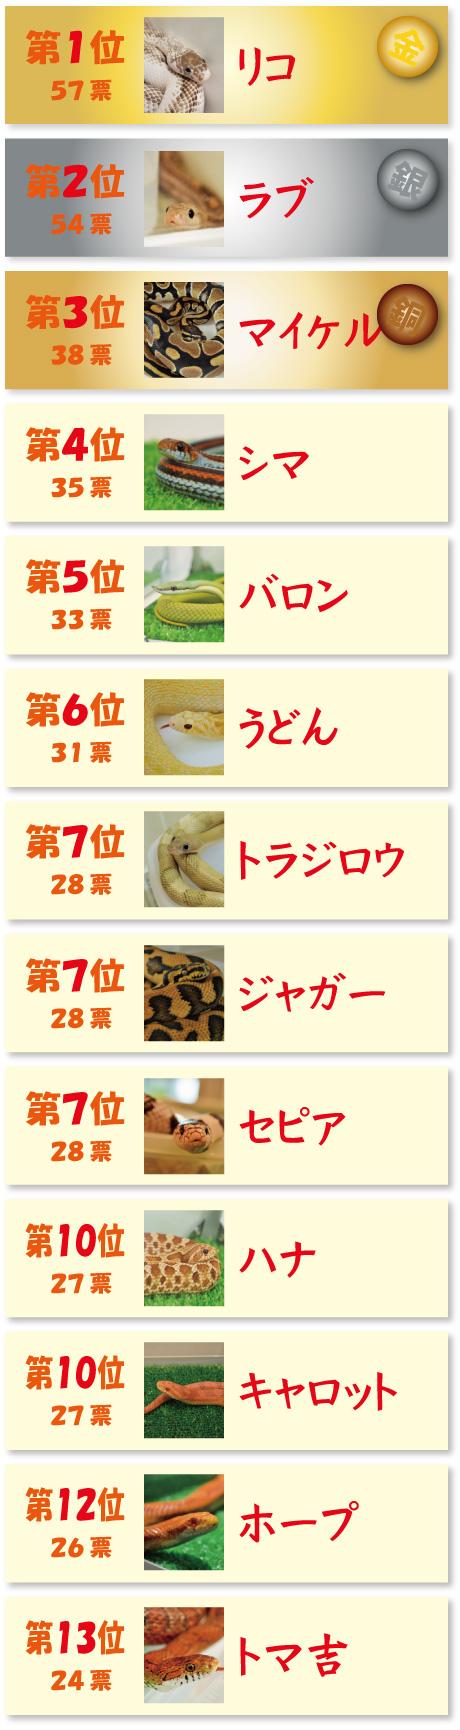 web_senkyo_result01-13